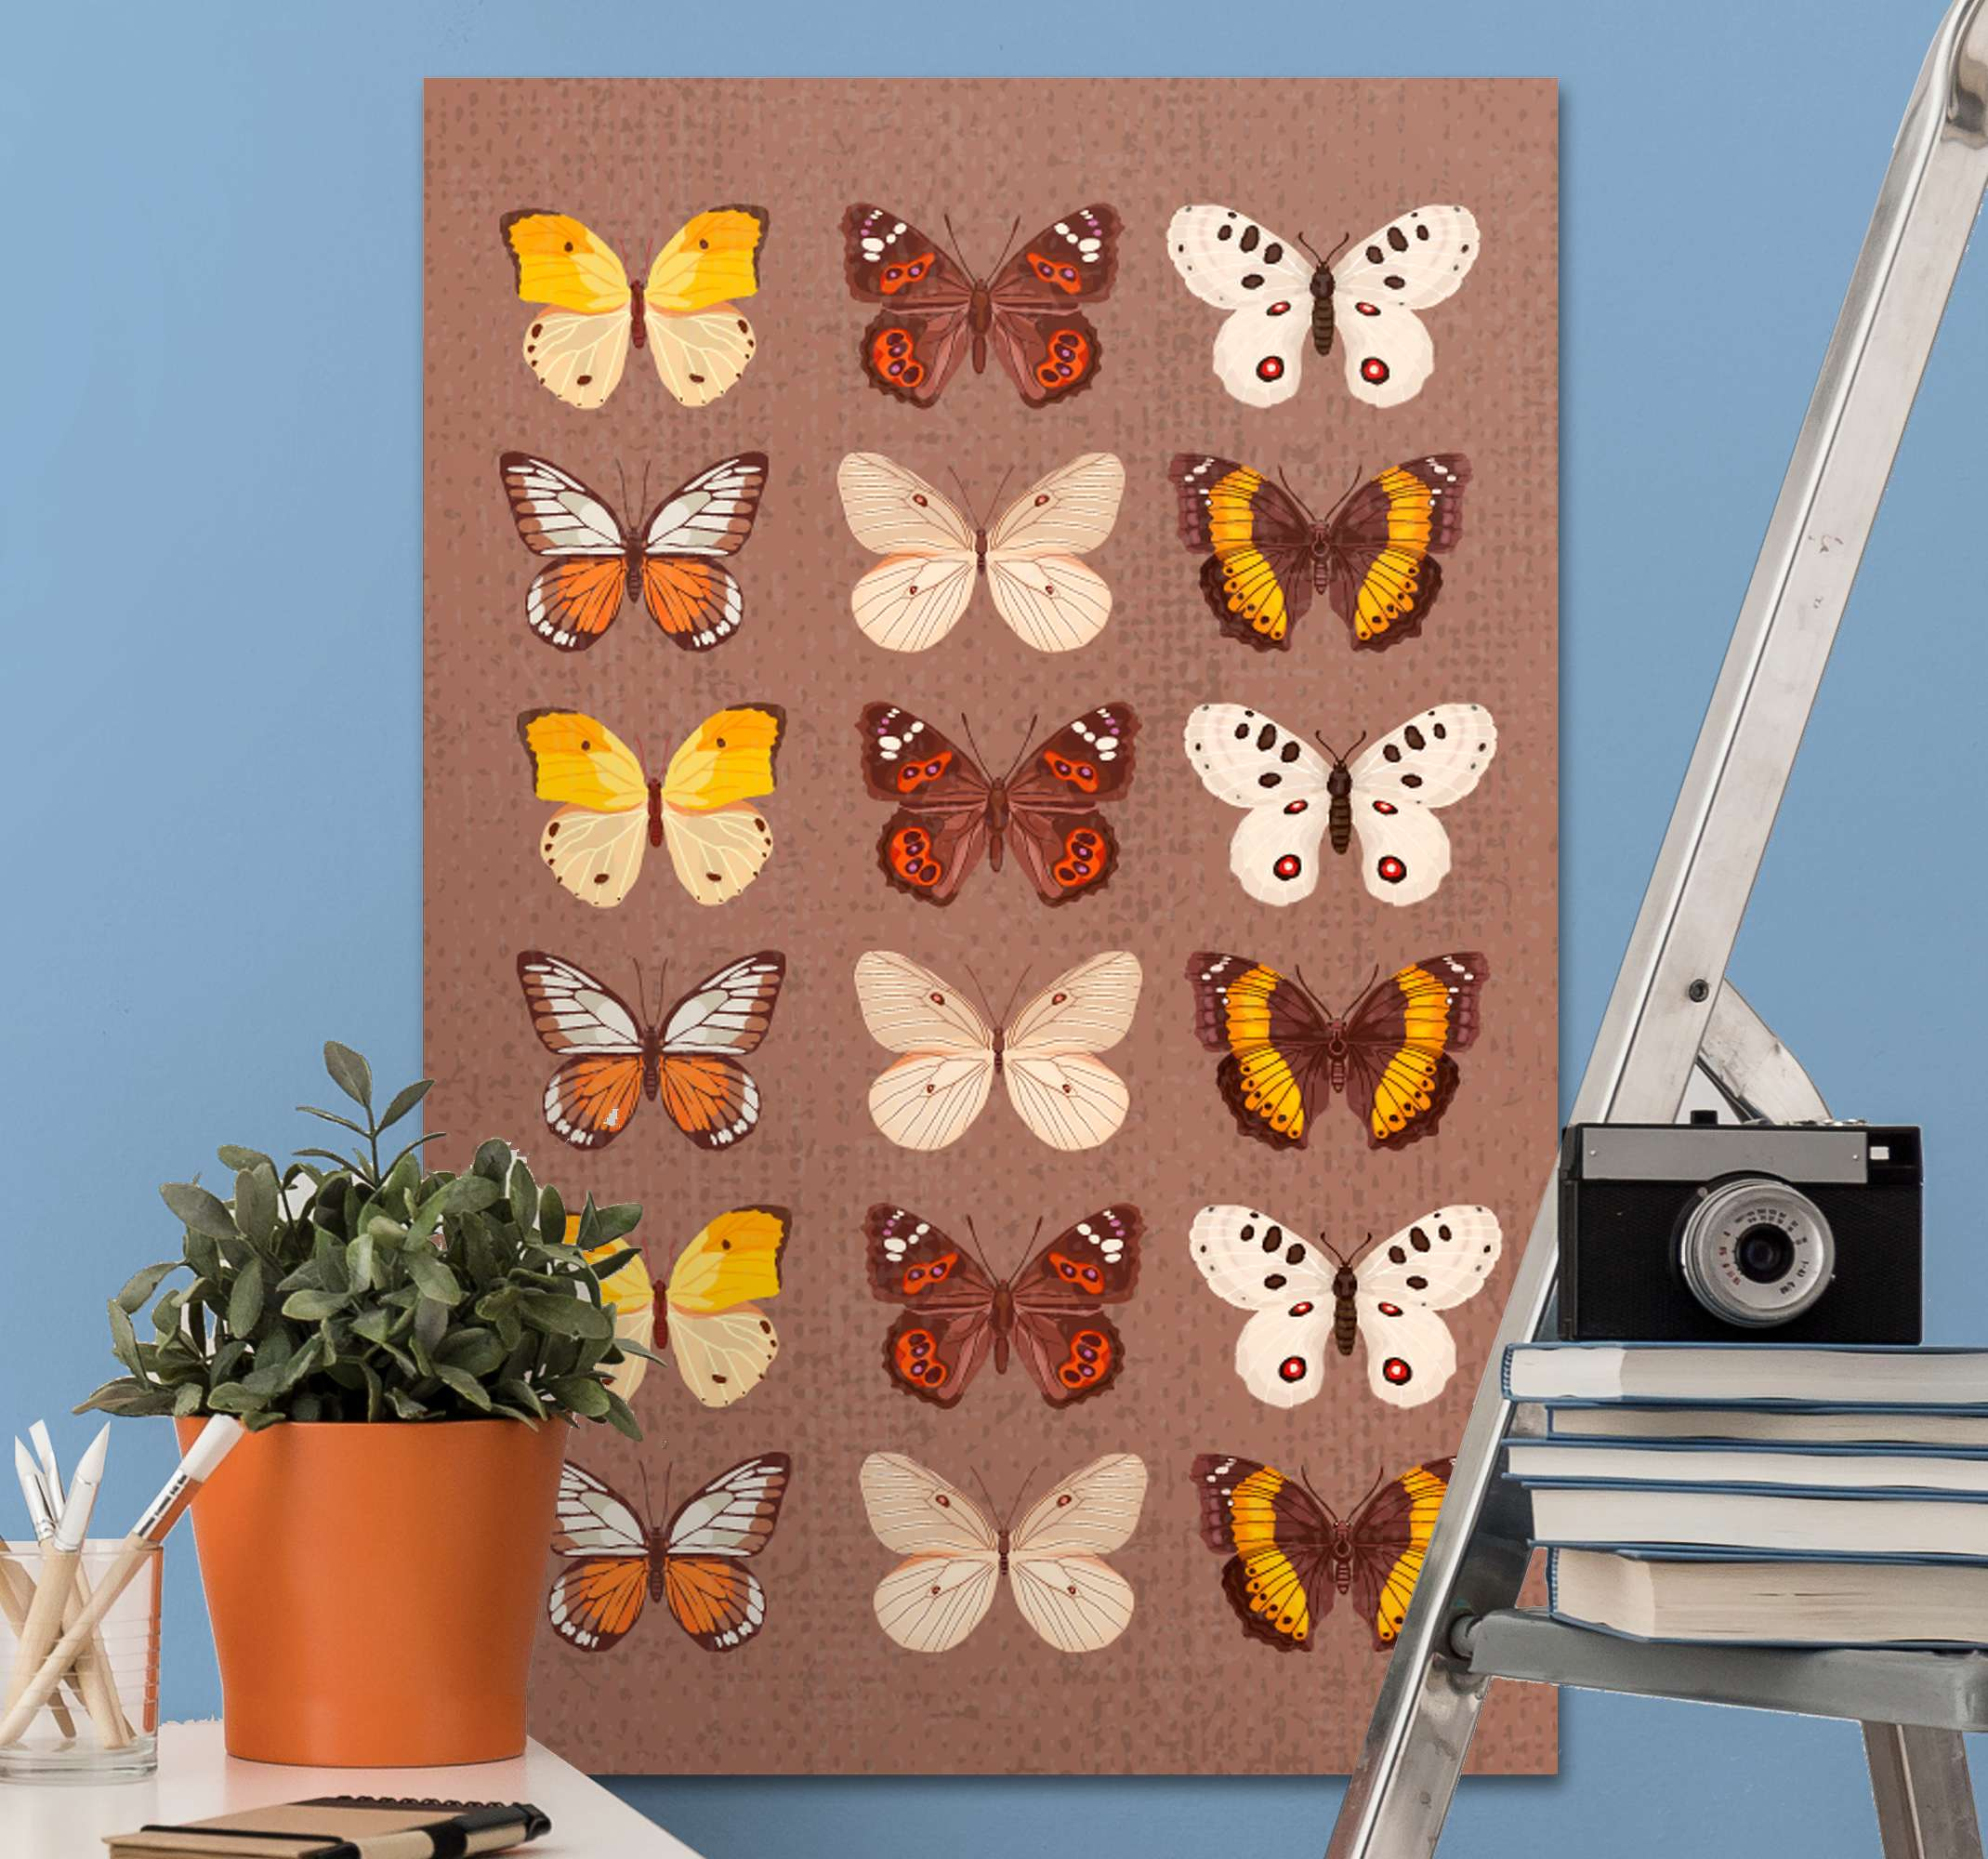 TenStickers. 老式的蝴蝶老式的壁画. 蝴蝶爱好者的老式蝴蝶图案画布艺术。适用于房屋中的任何空间以及办公室和商业场所。